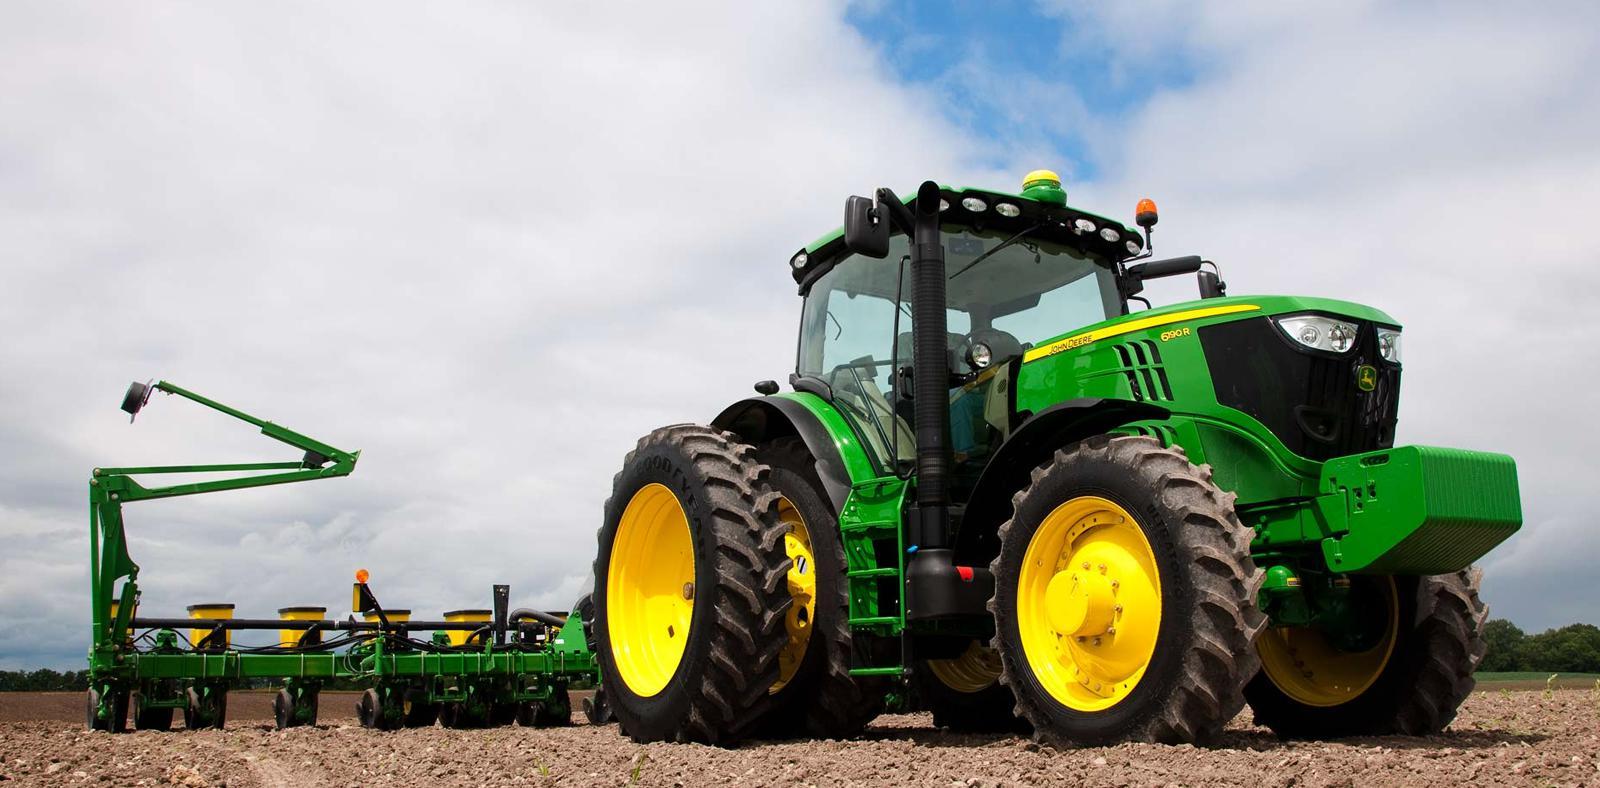 pre owned farm equipment for sale john deere tractors lawn